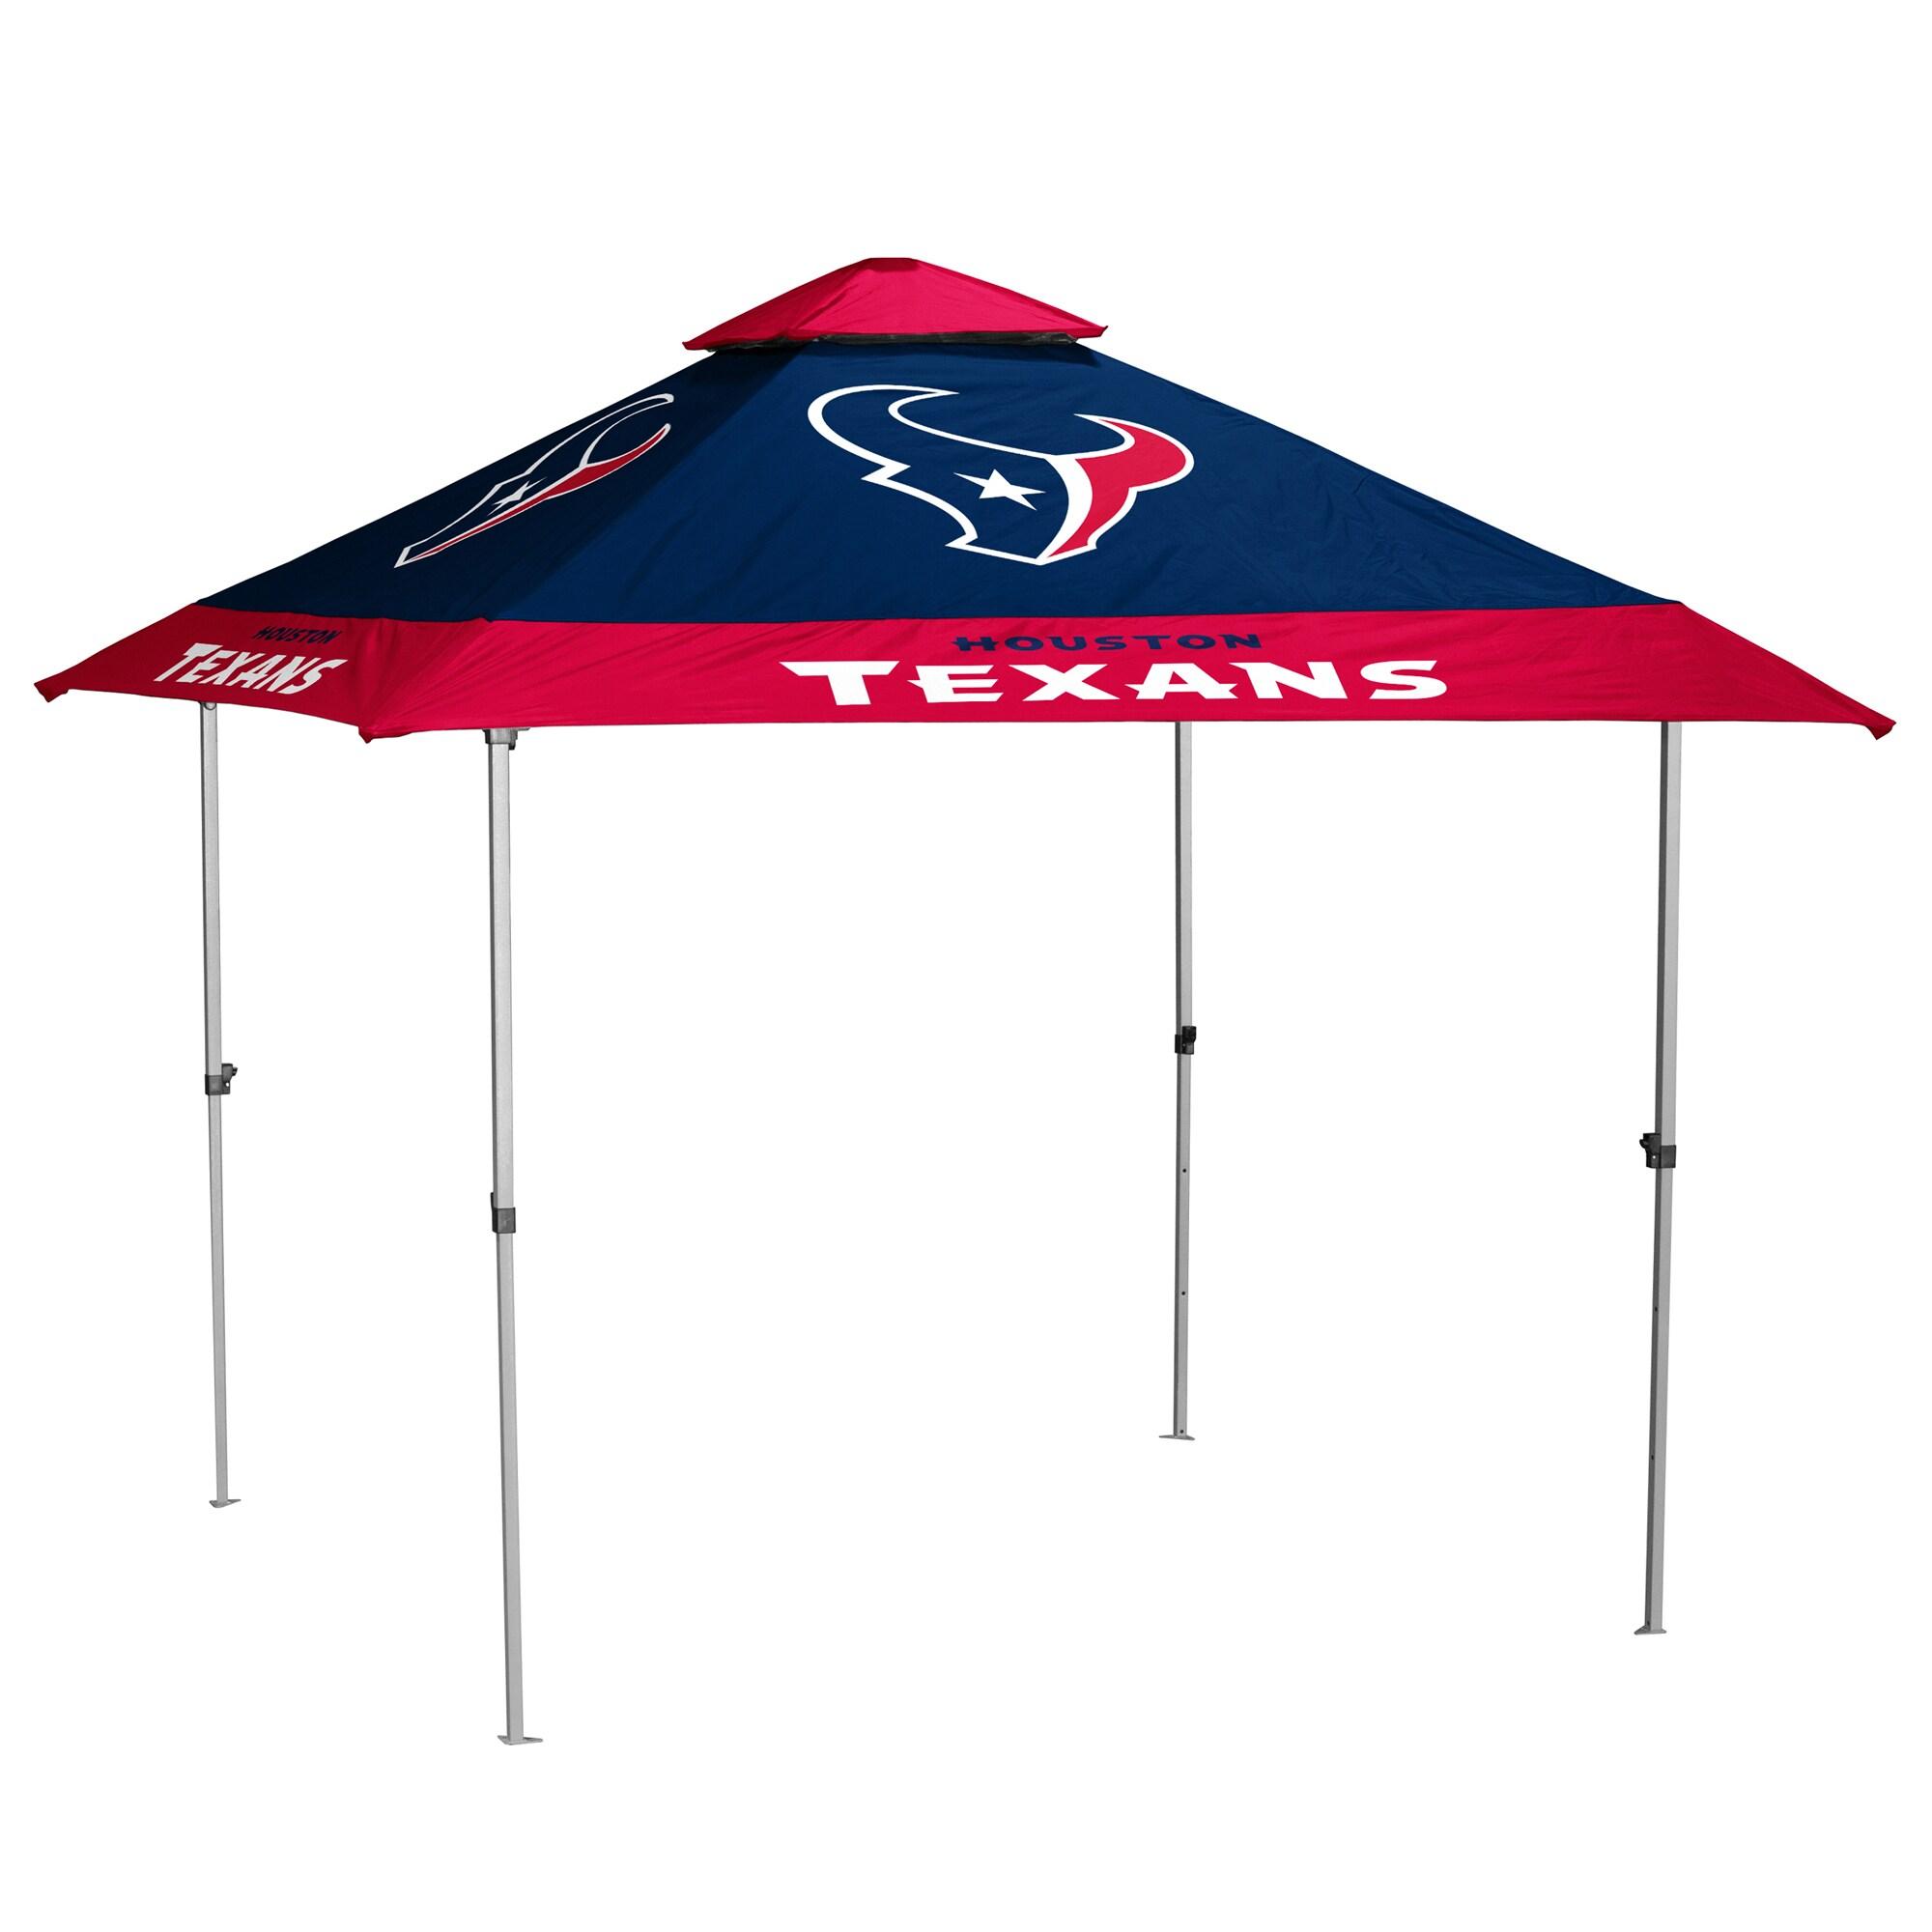 Houston Texans 9' x 9' Pagoda Tailgate Canopy Tent